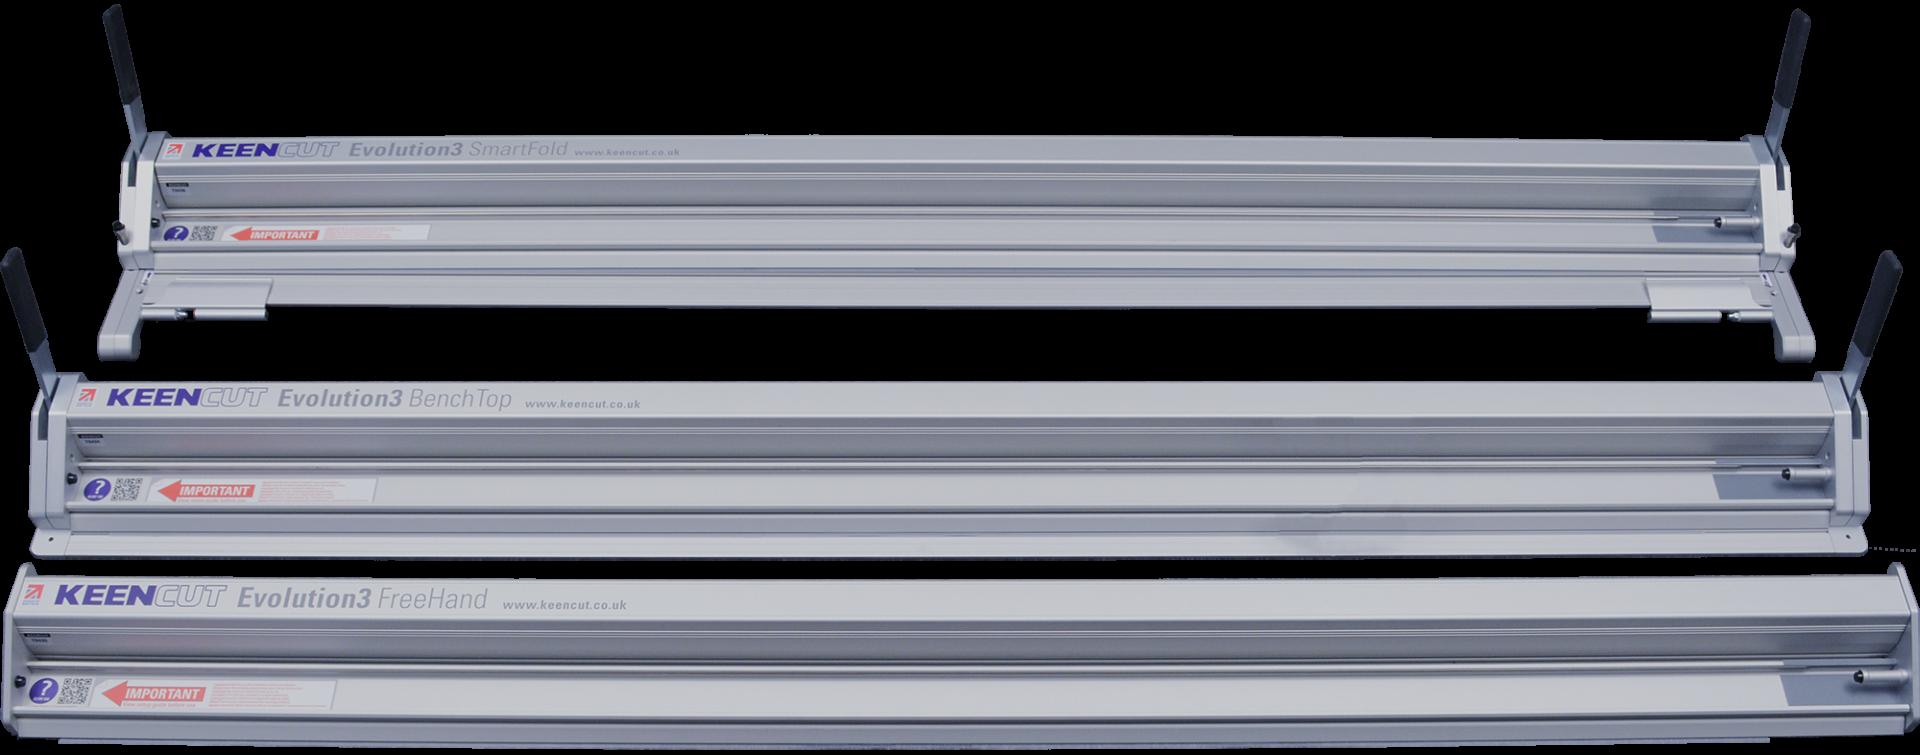 Инструменты Keencut Evolution 3 - фото №2